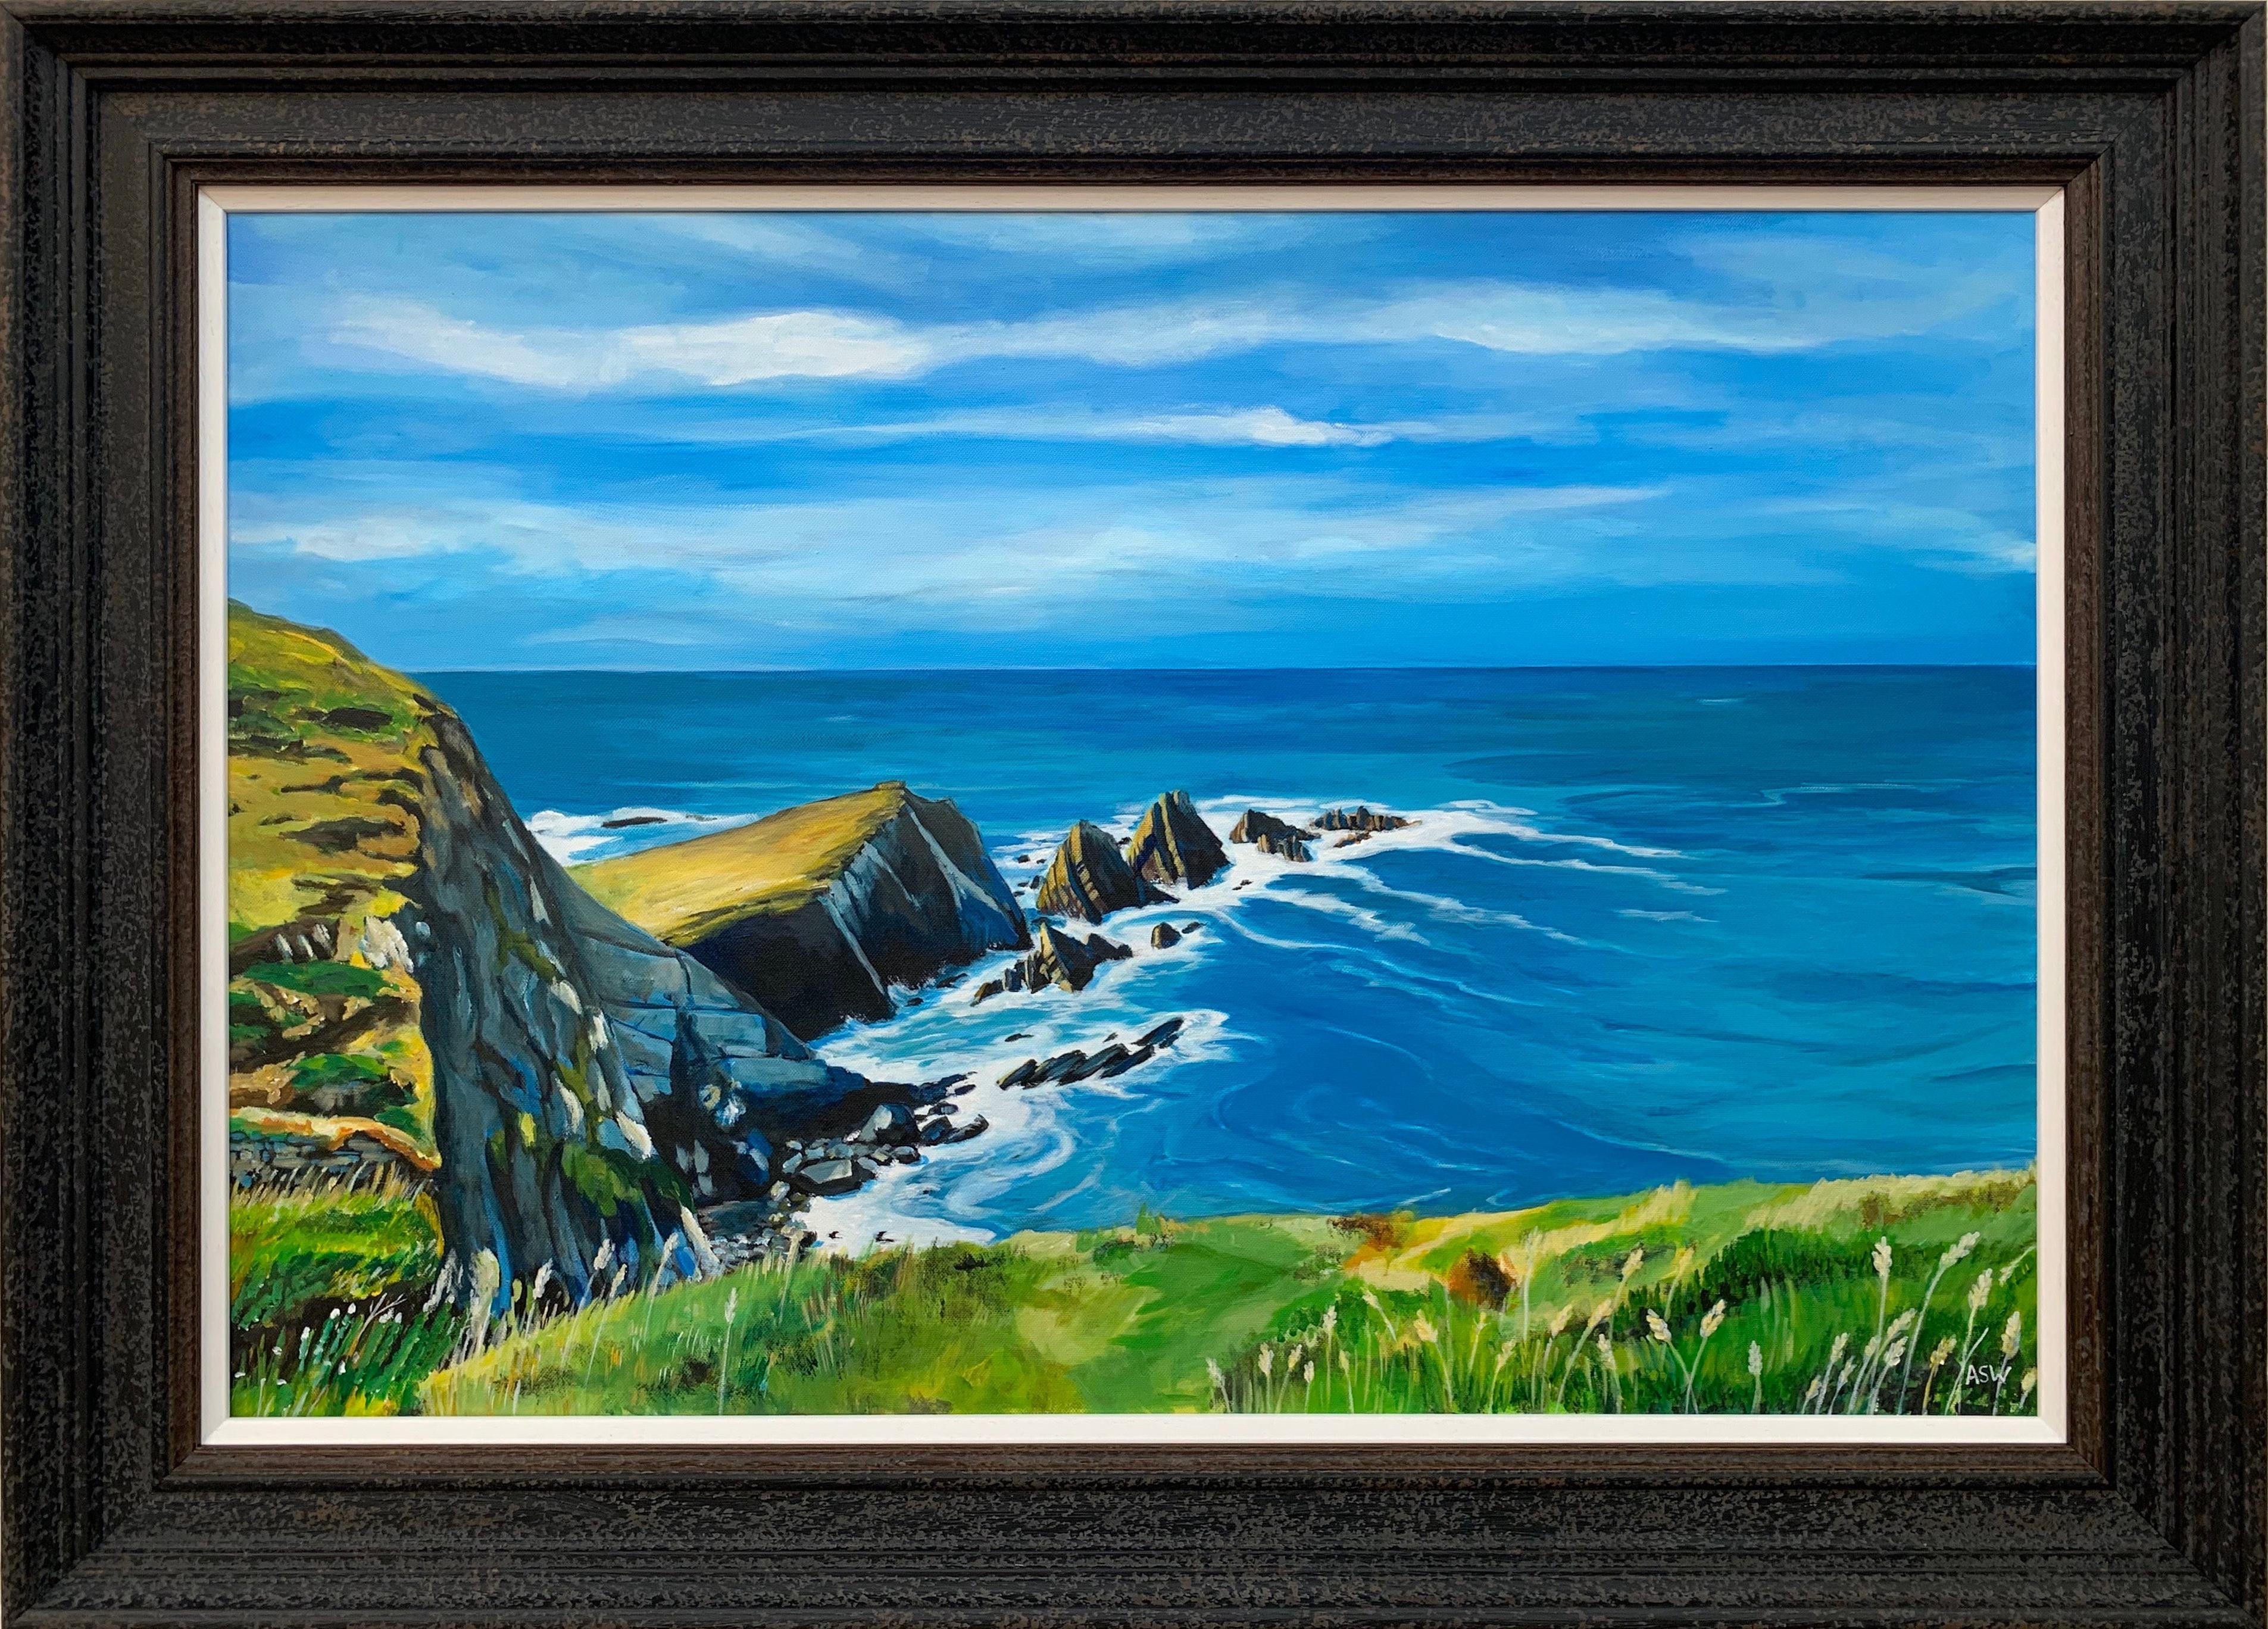 Seascape Landscape Painting of Hartland Point in Devon England by British Artist